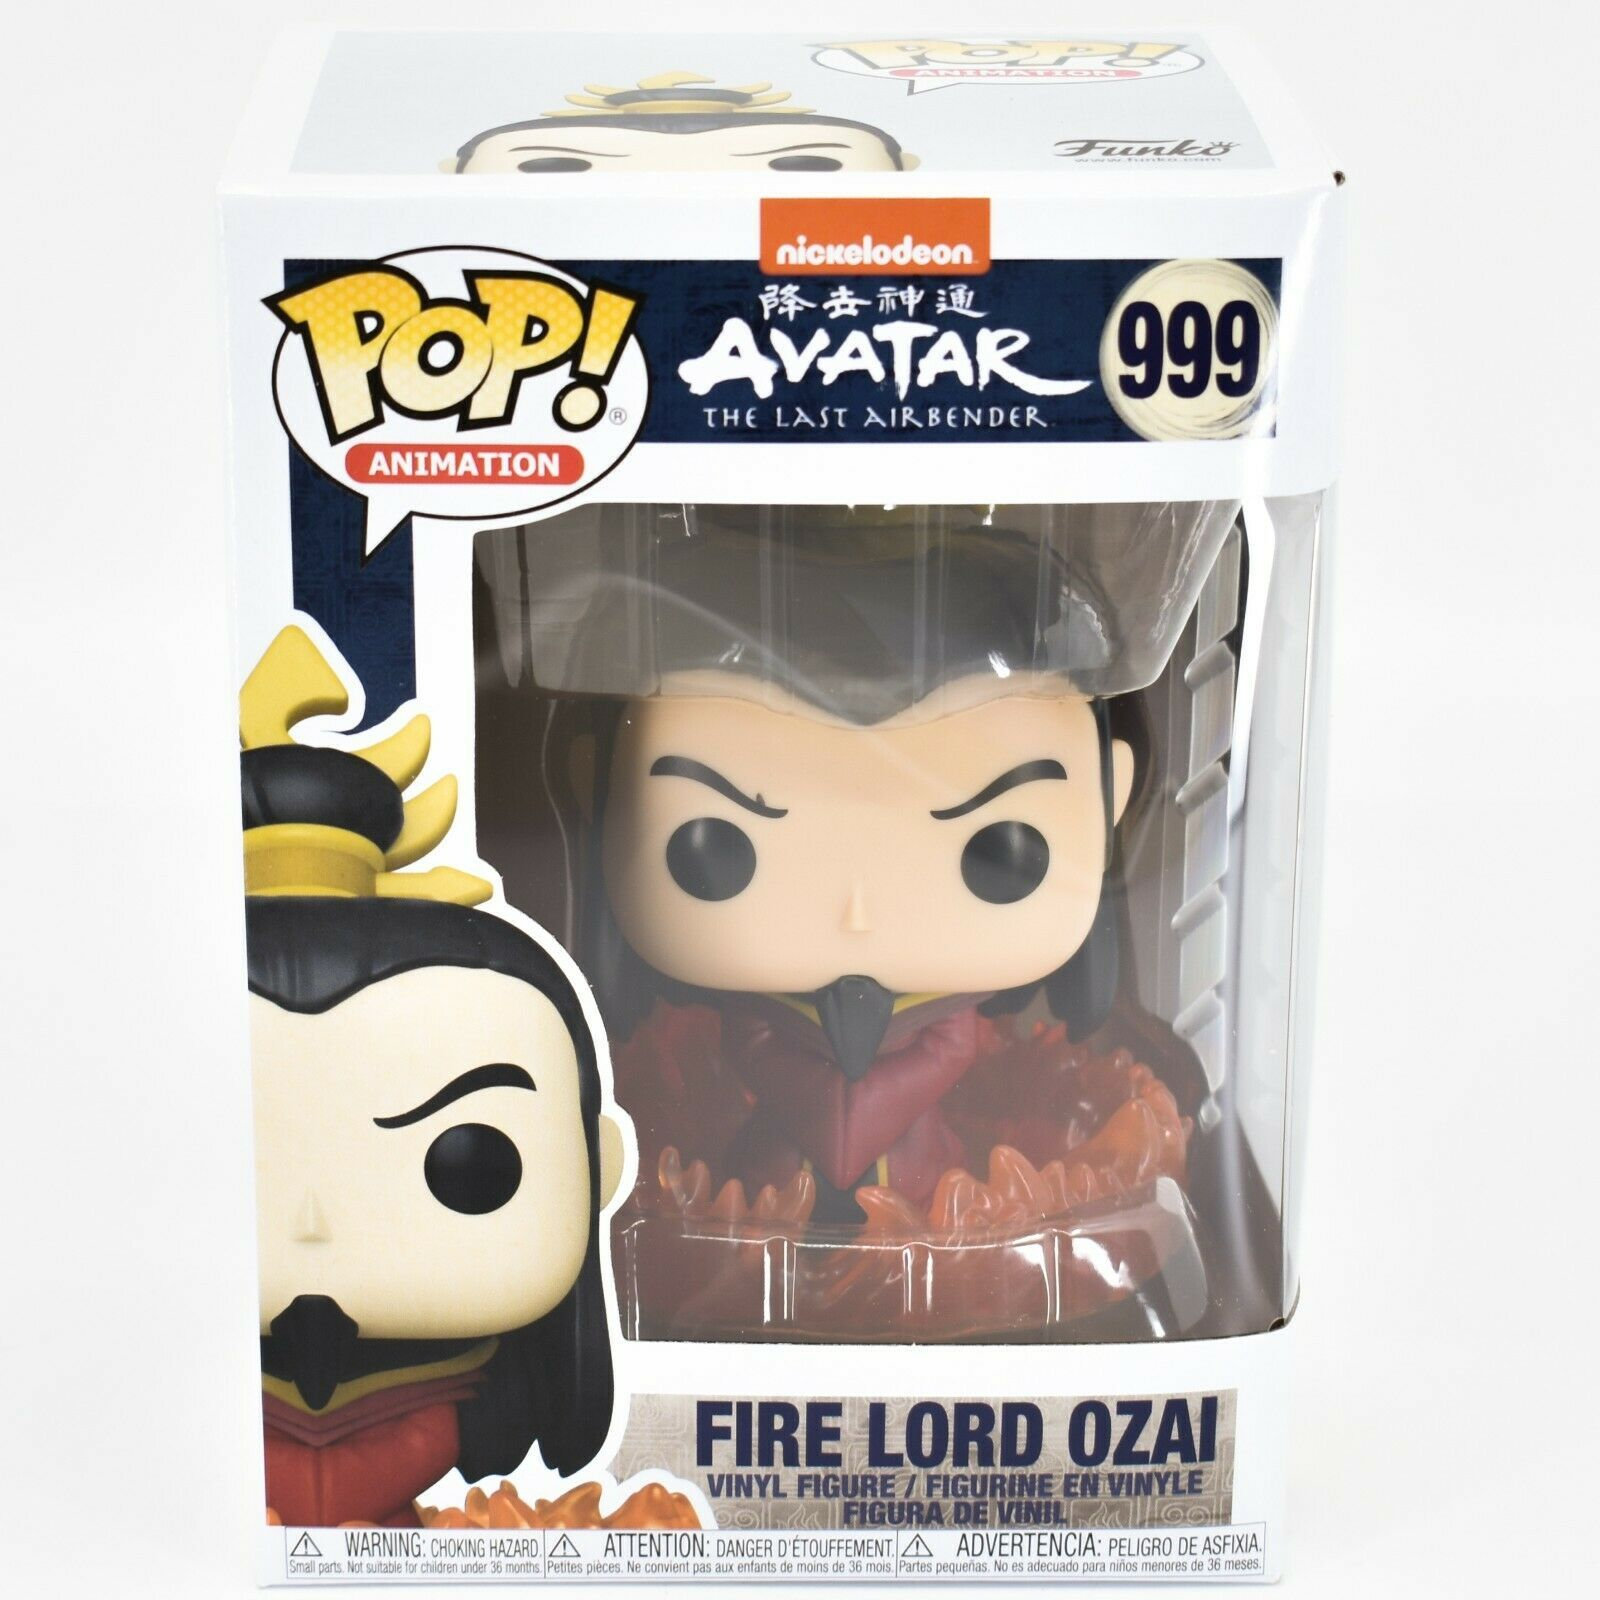 Funko Pop Nickelodeon Avatar the Last Airbender Fire Lord Ozai #999 Vinyl Figure